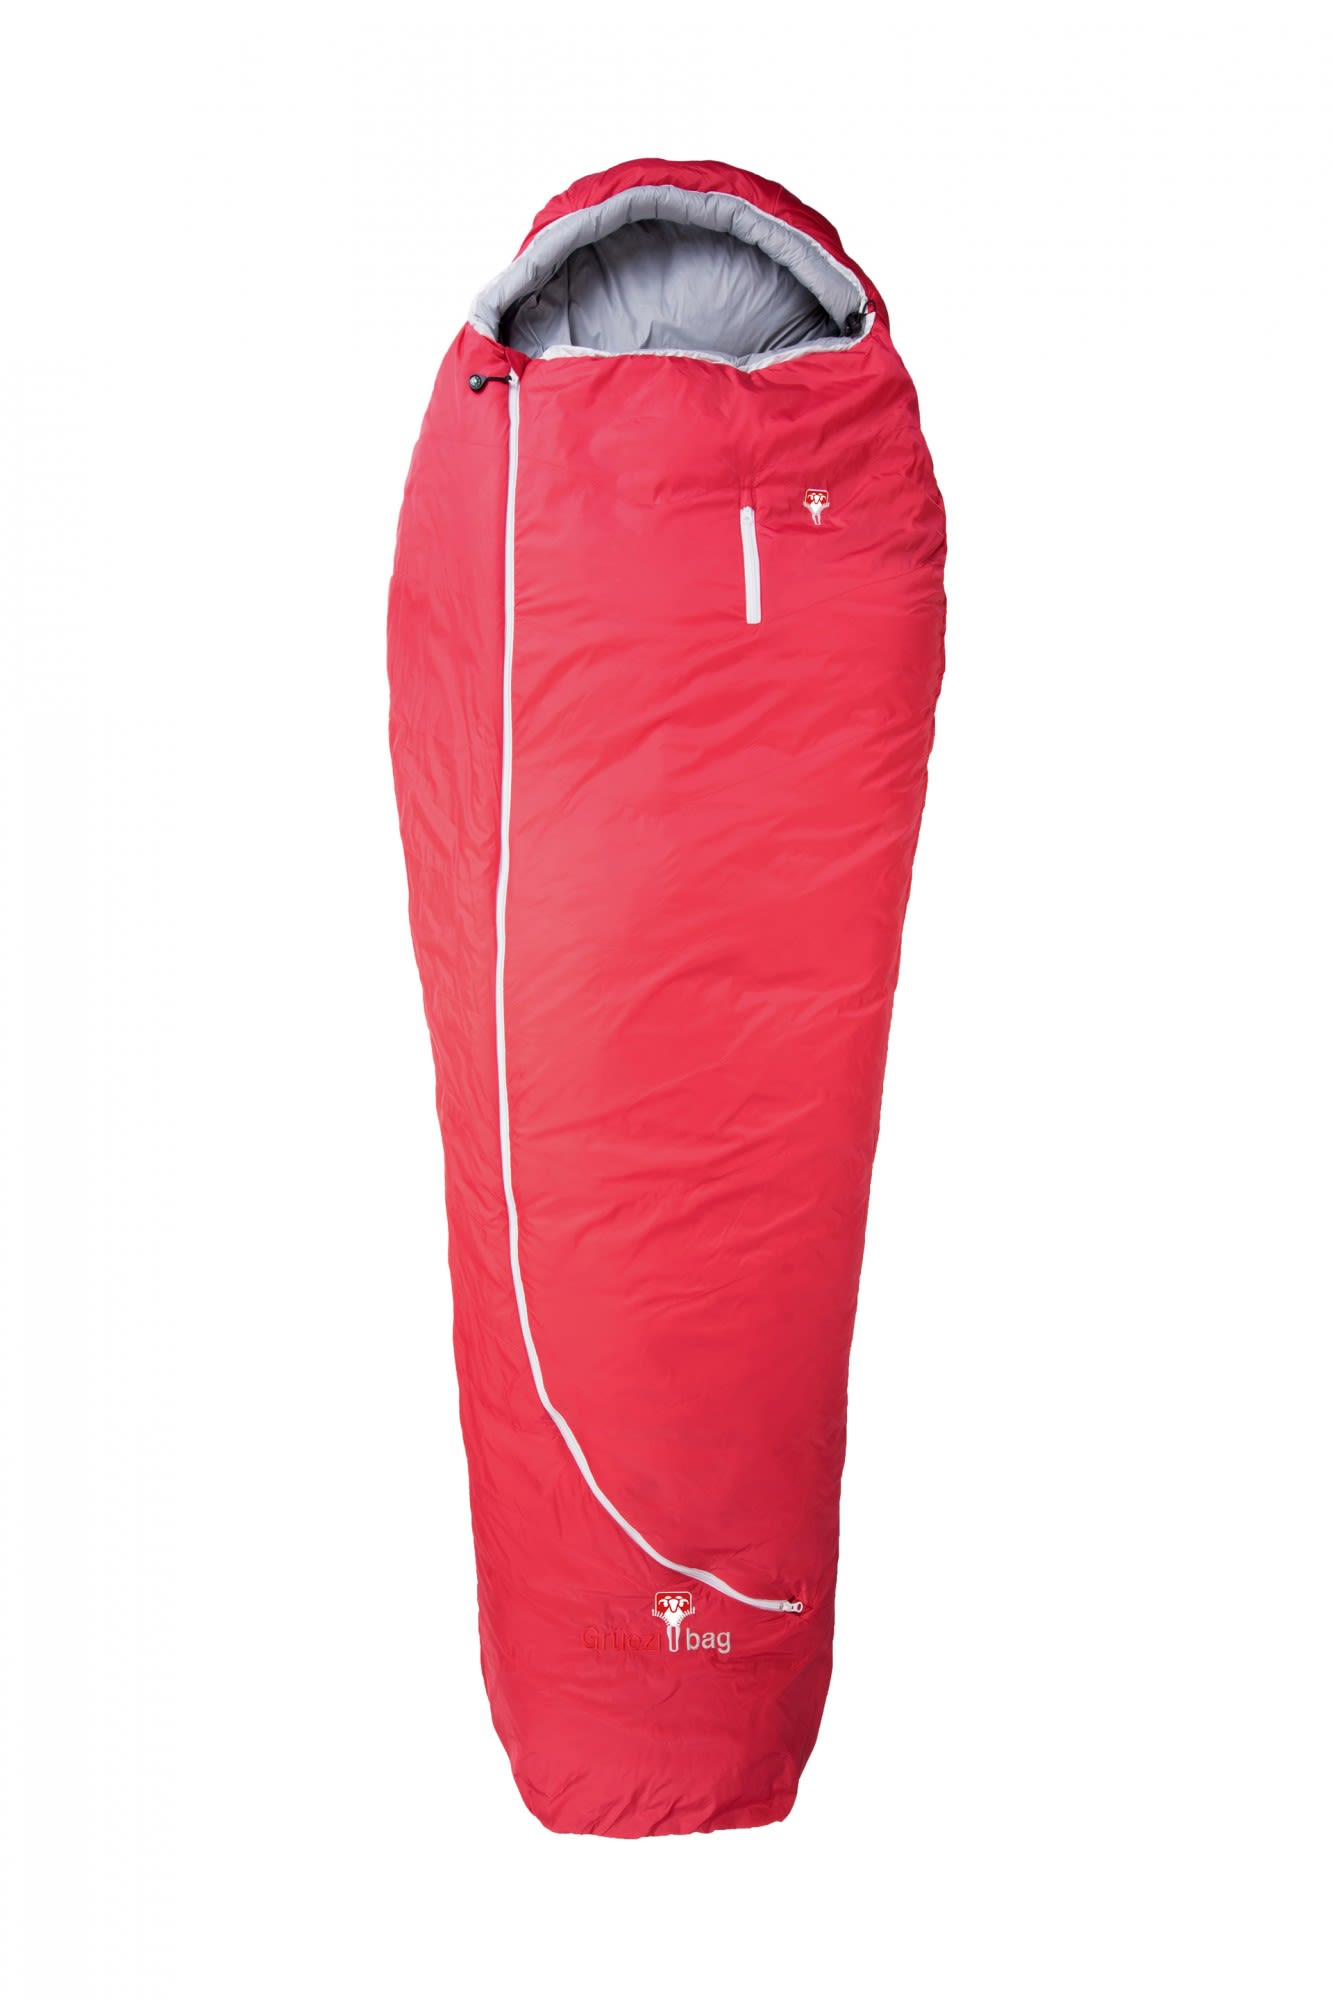 Grüezi Bag Biopod Wolle Zero XL Rot, Daunen Wollschlafsack, 230 cm